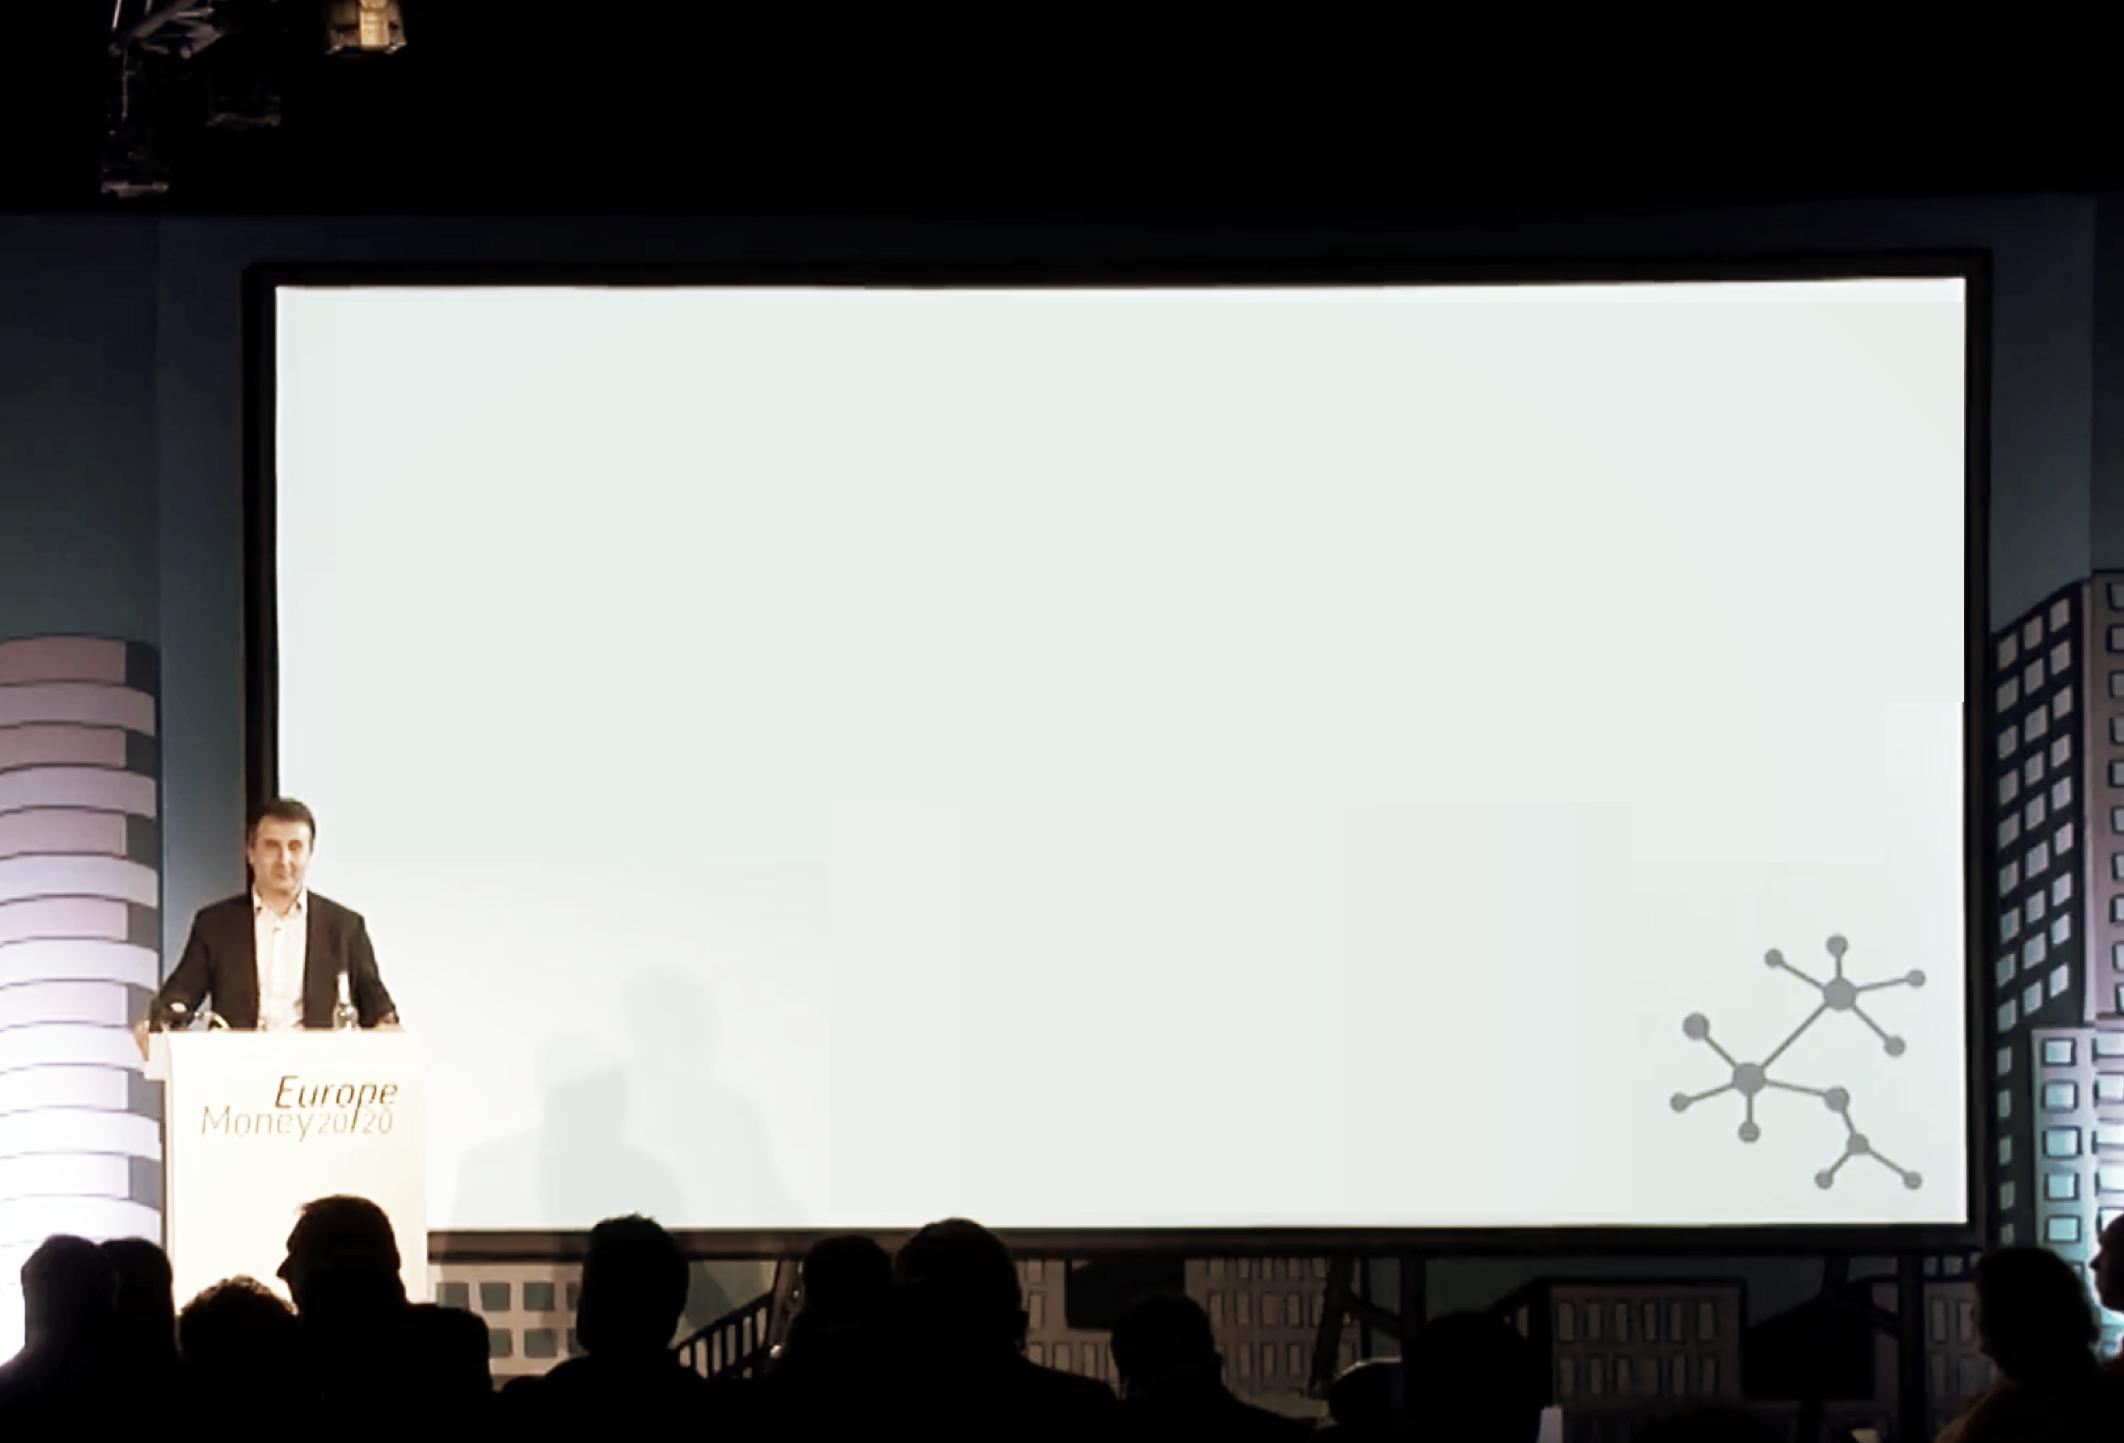 Open Banking APIsMoney2020 Europe - Panel Discussion